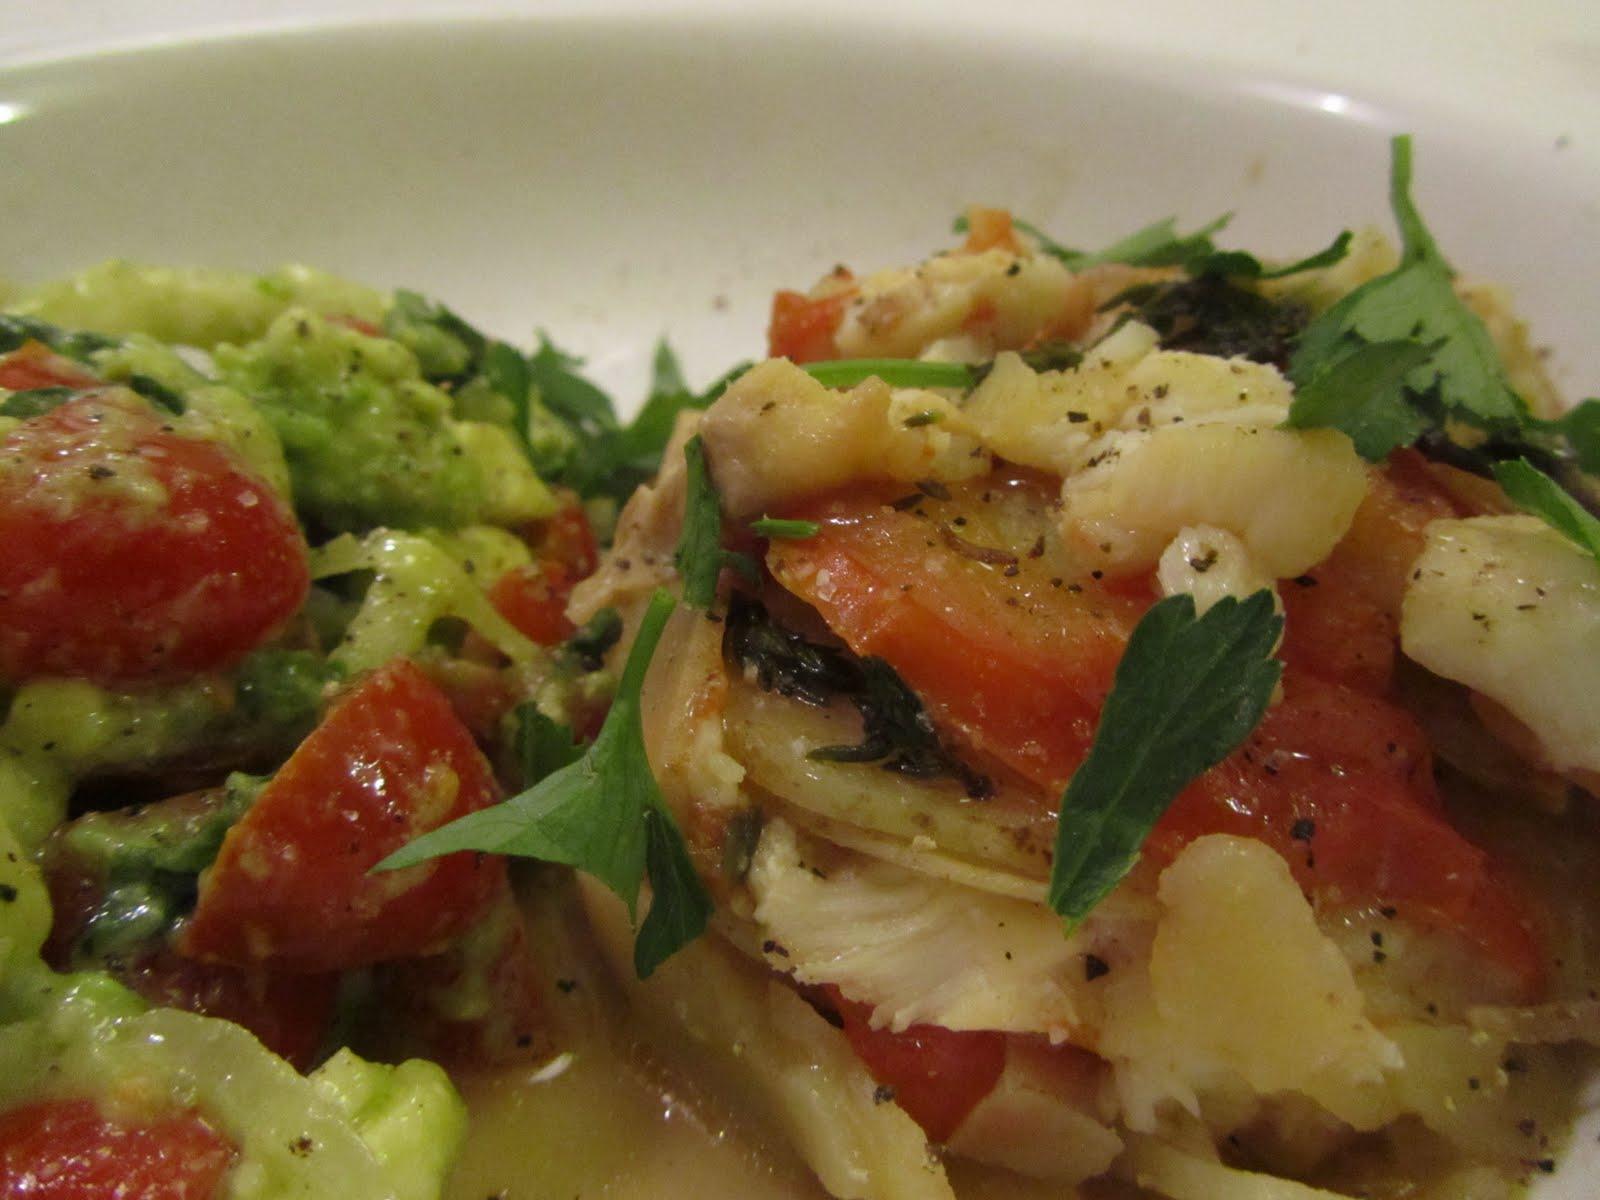 Cod and Potato stew with Avocado and mozzarella Salad